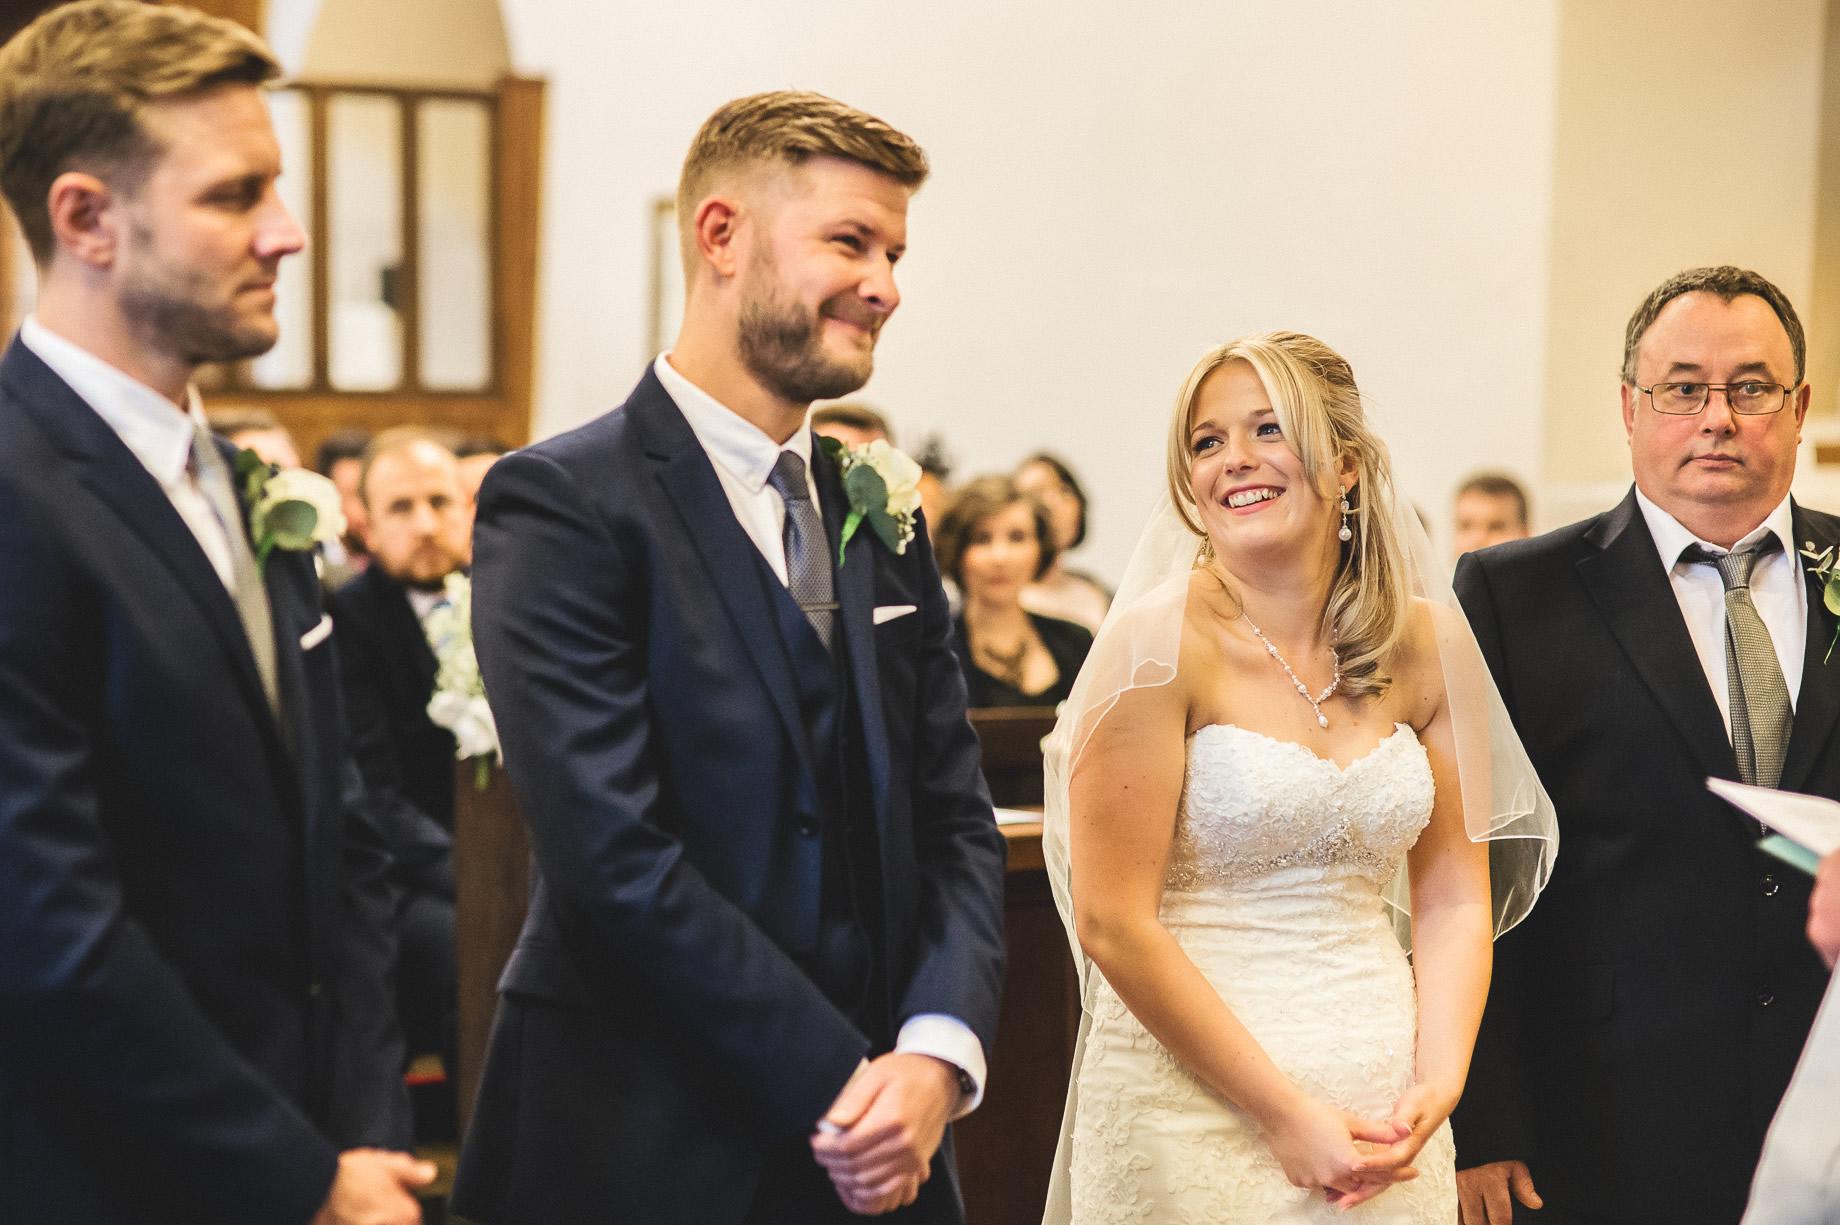 Jenny and Chris' Wedding at Mitton Hall 092